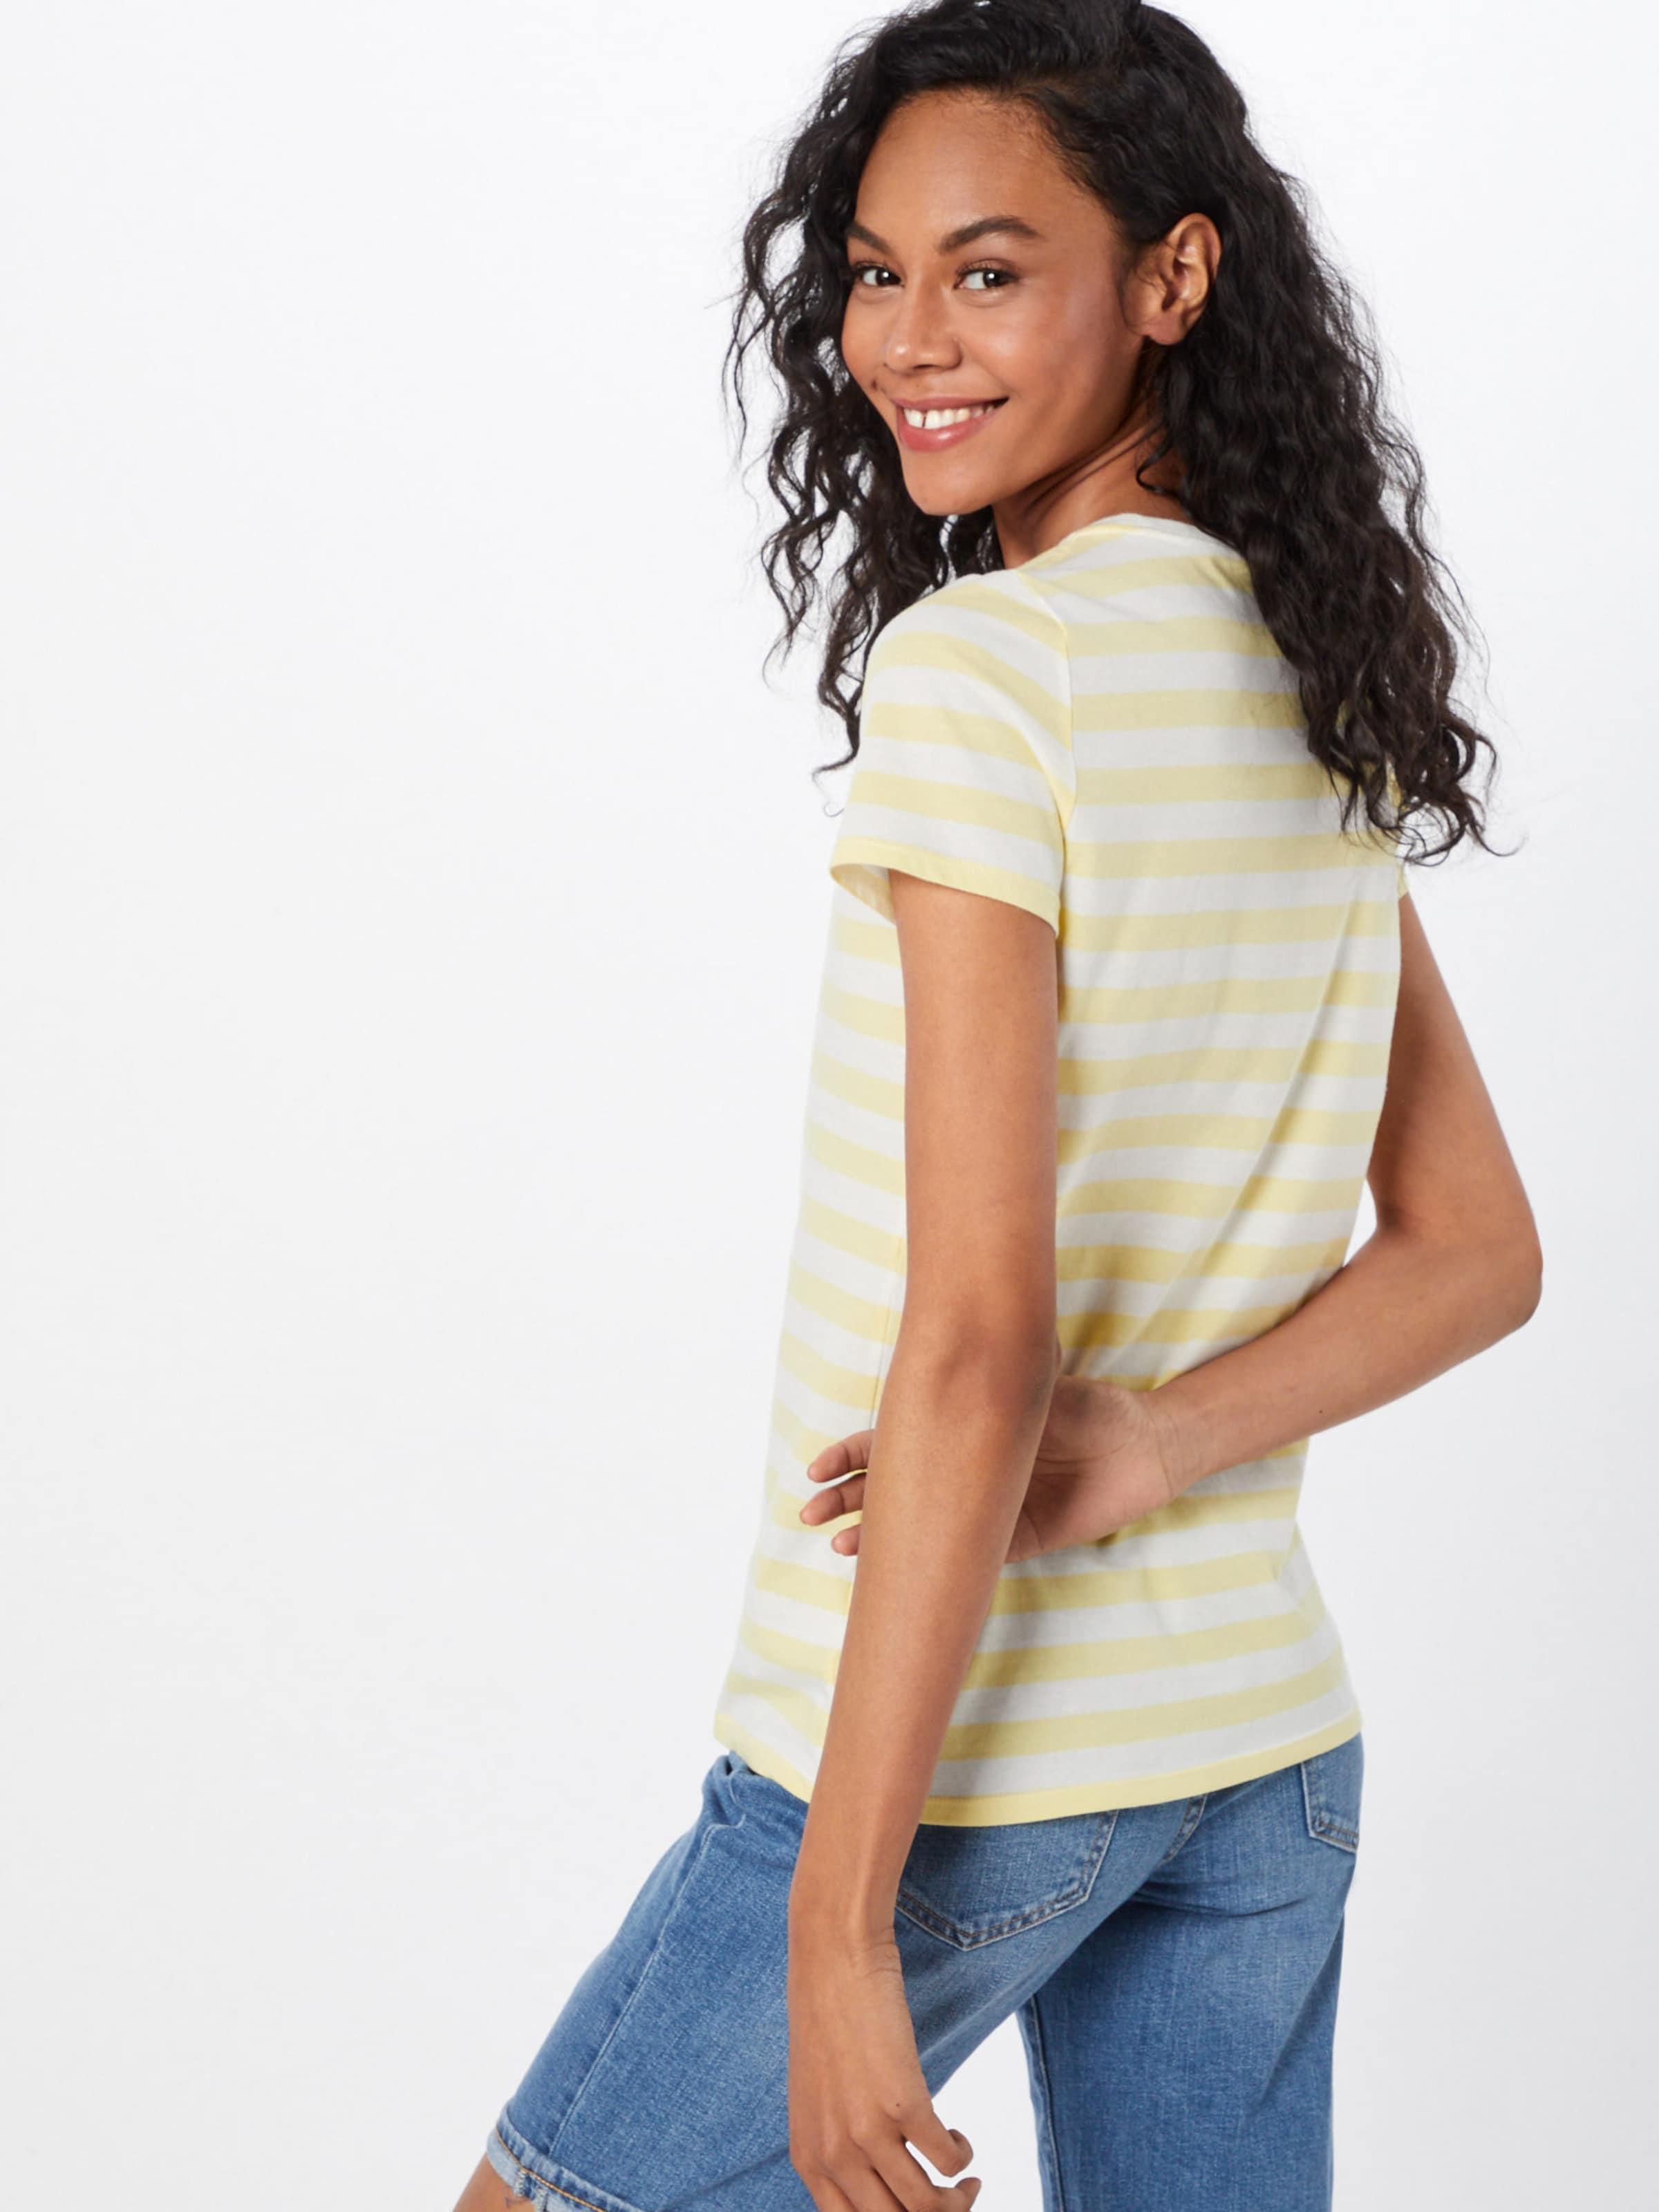 Gap En shirt shirt Gap T Gap T En Jaune shirt T Jaune w8nXOPk0